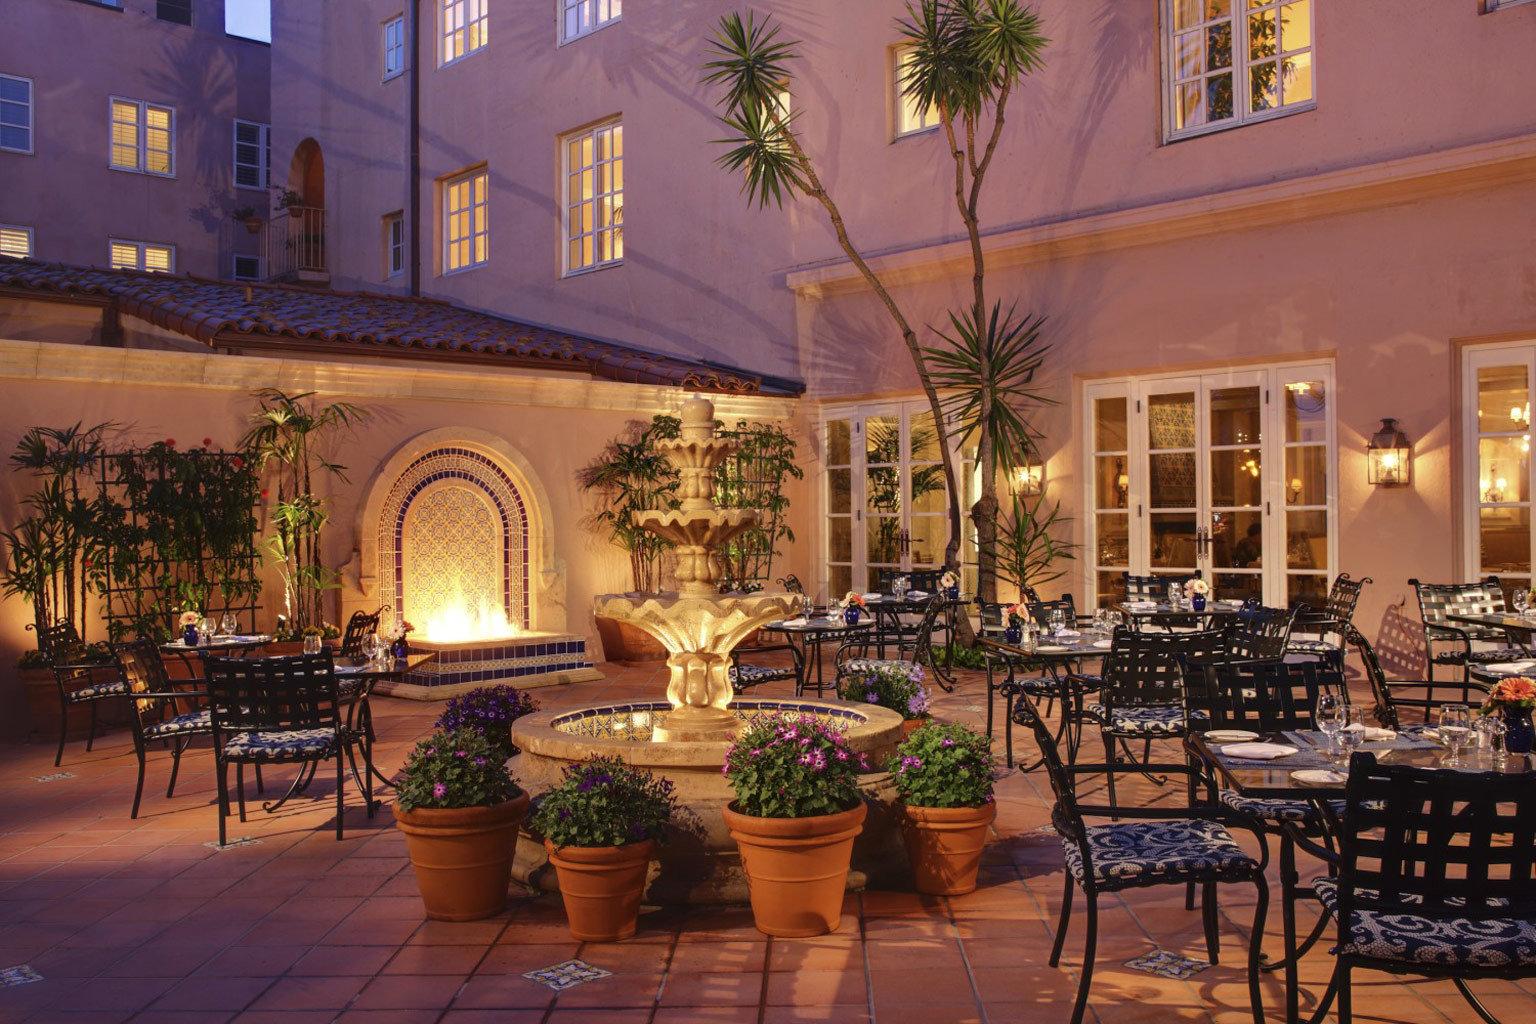 Dining Drink Eat Elegant Luxury Patio Terrace chair property Lobby restaurant Courtyard home palace hacienda Resort mansion